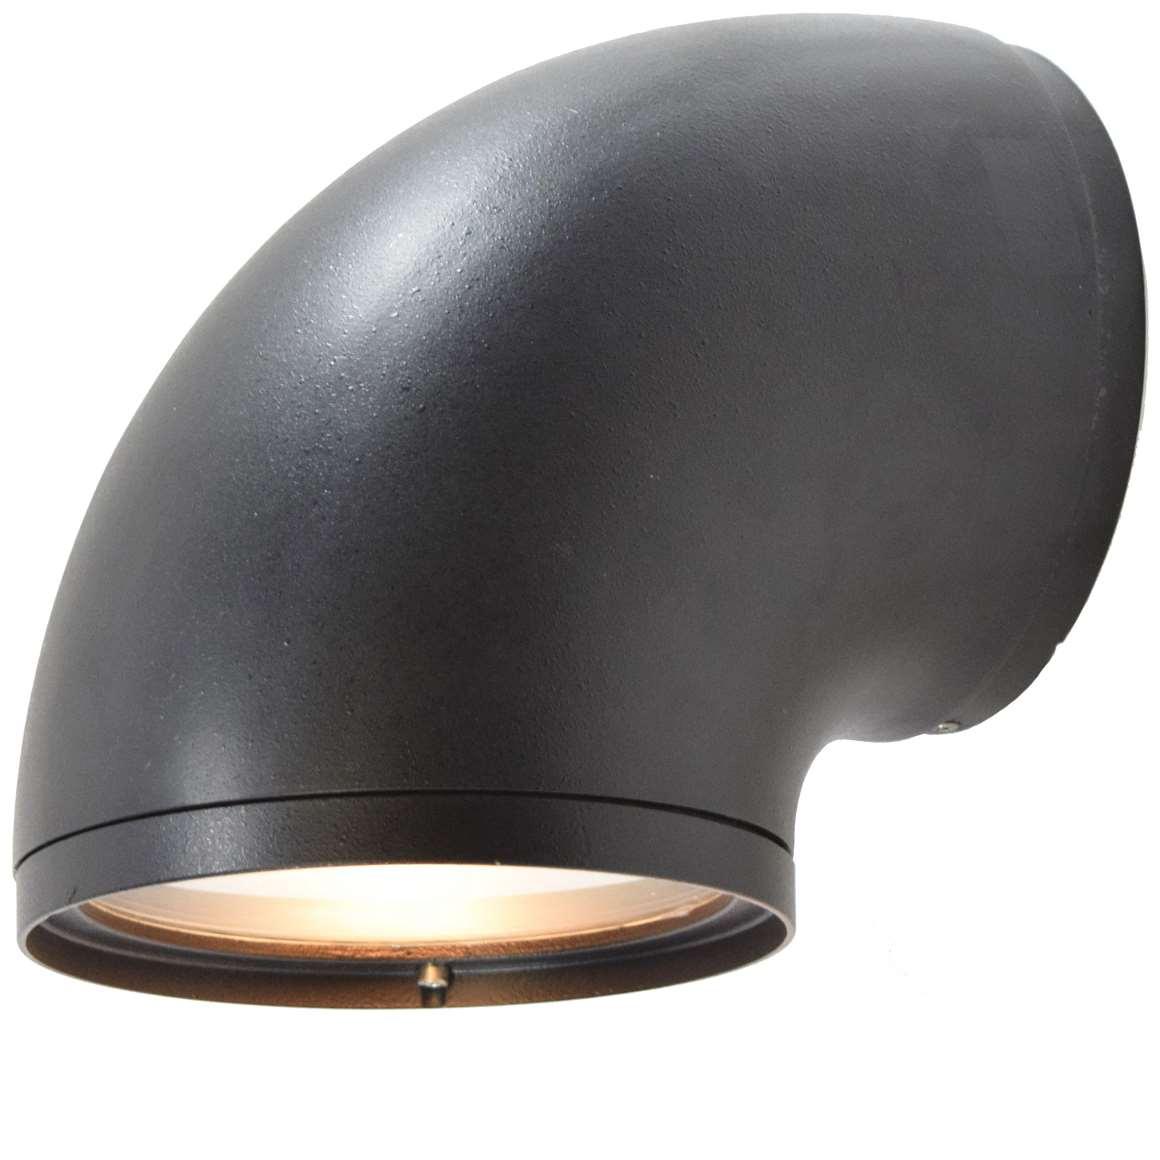 BEGA 1980s Outdoor Wall Lamp 2276